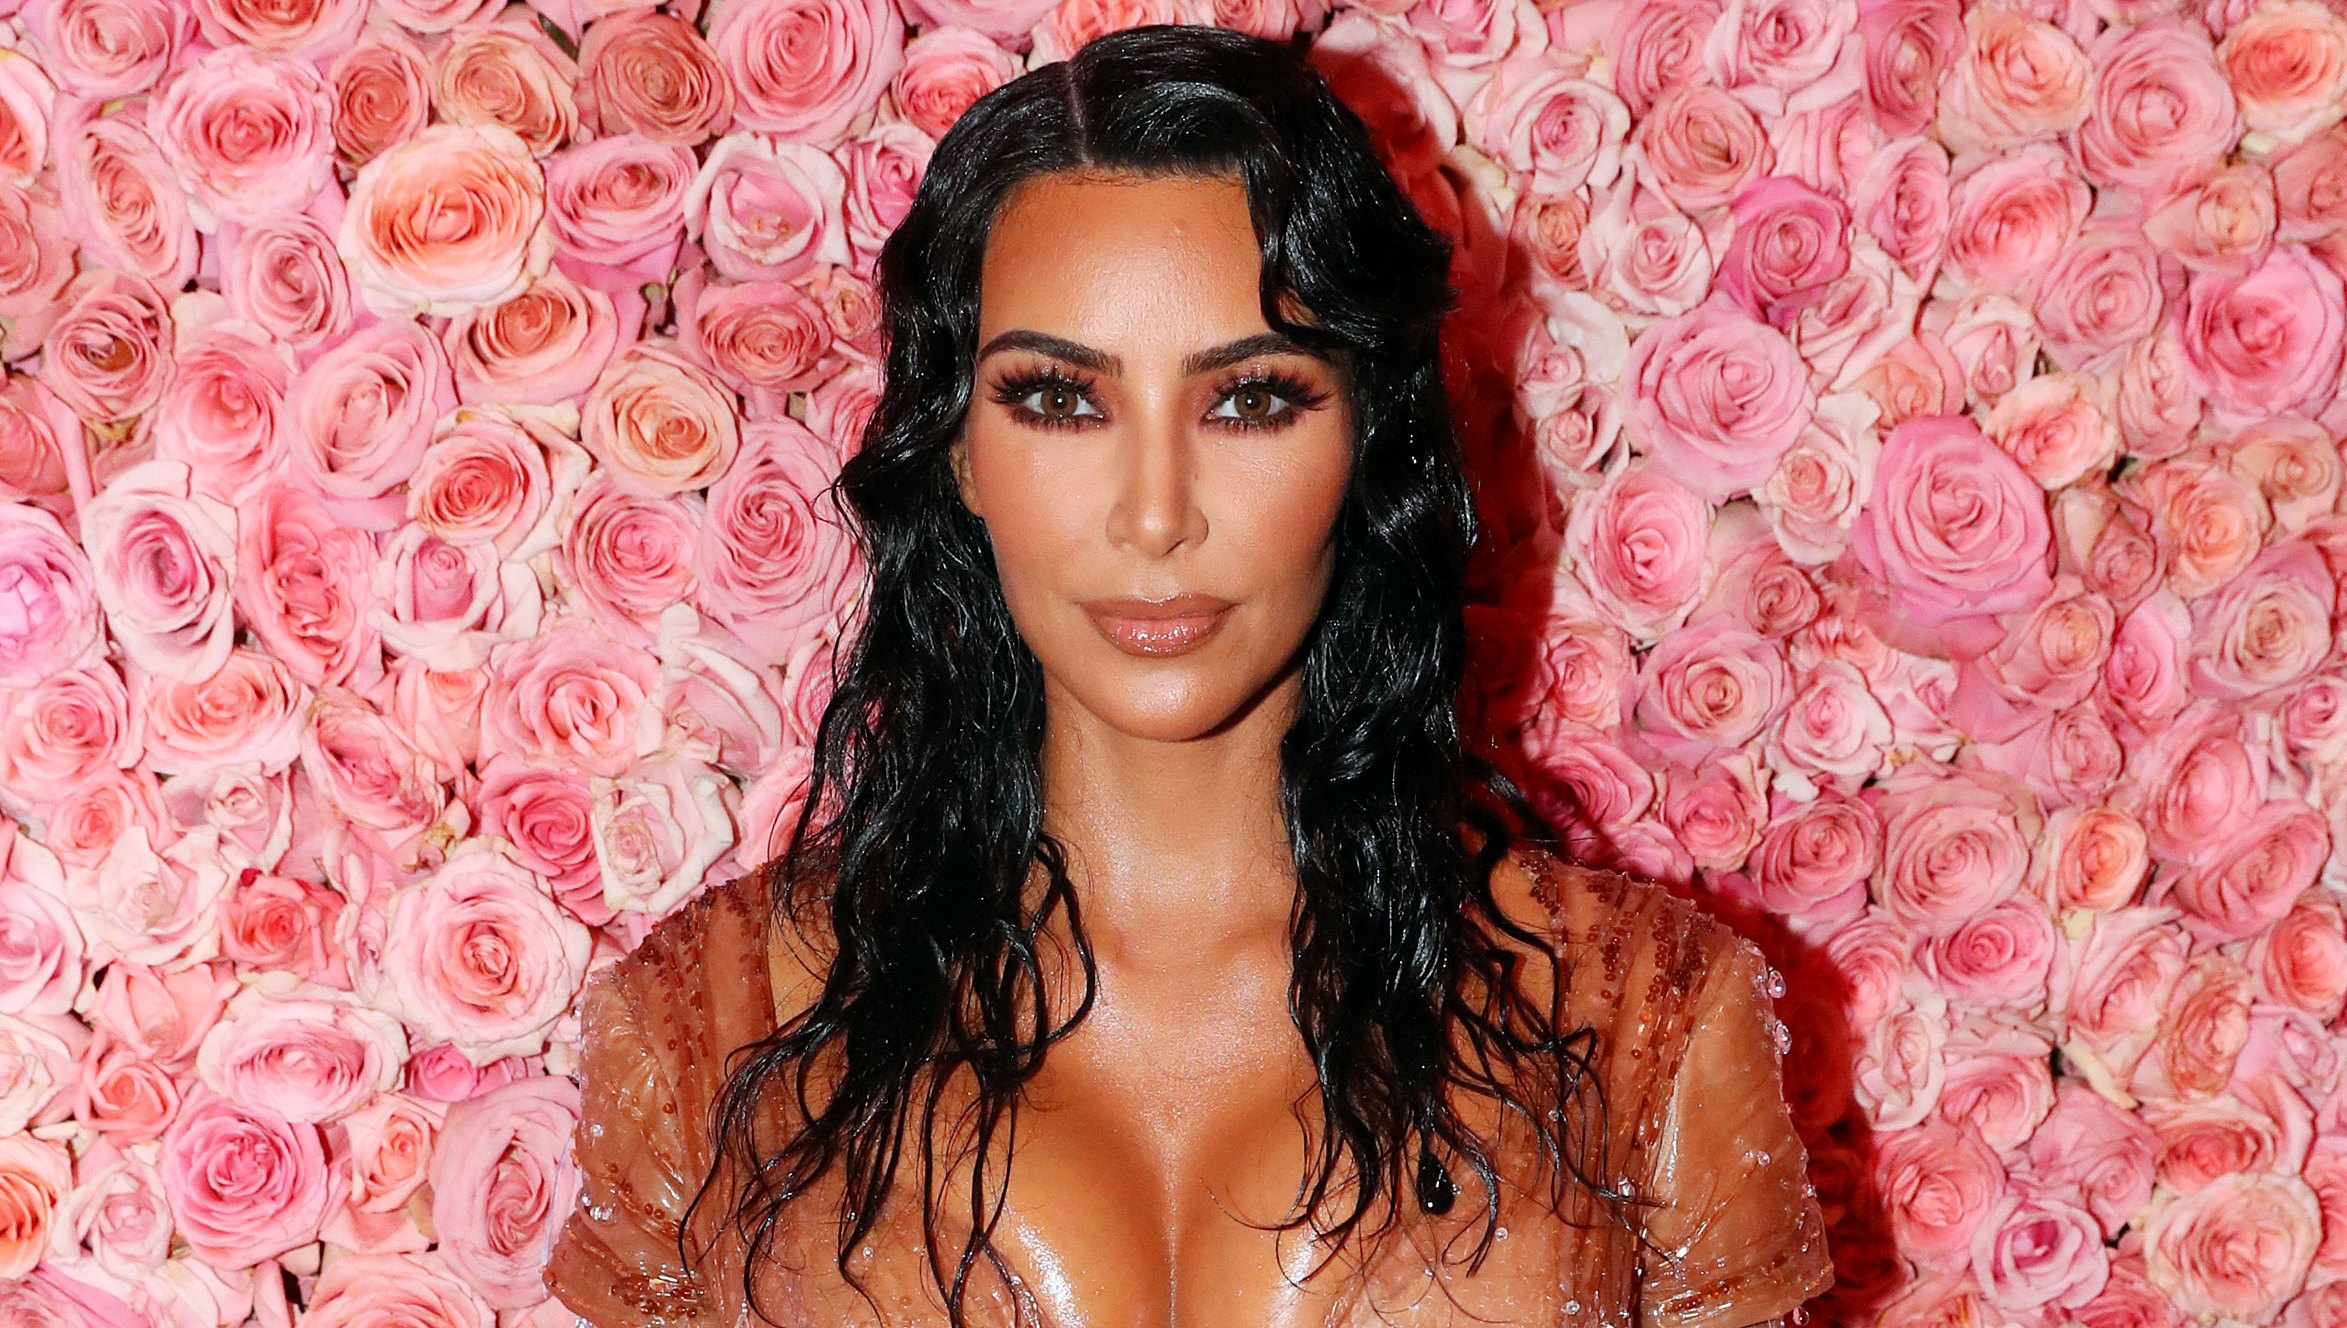 Kim Kardashian Says New Baby Boy Is 'Calm and Chill'